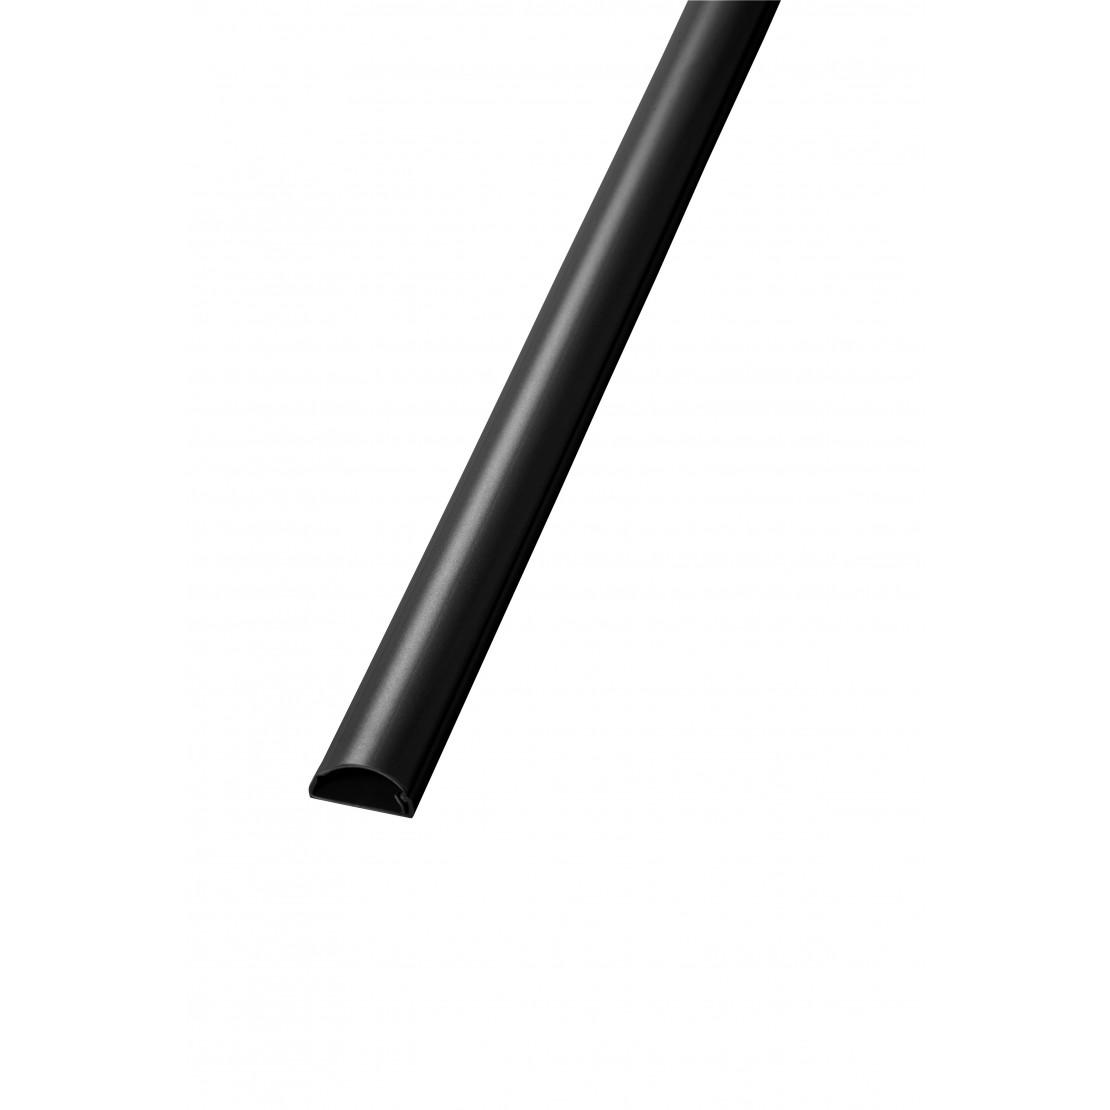 Kabelgoot D-Vorm 30x15mmZelfklevend 2M Zwart